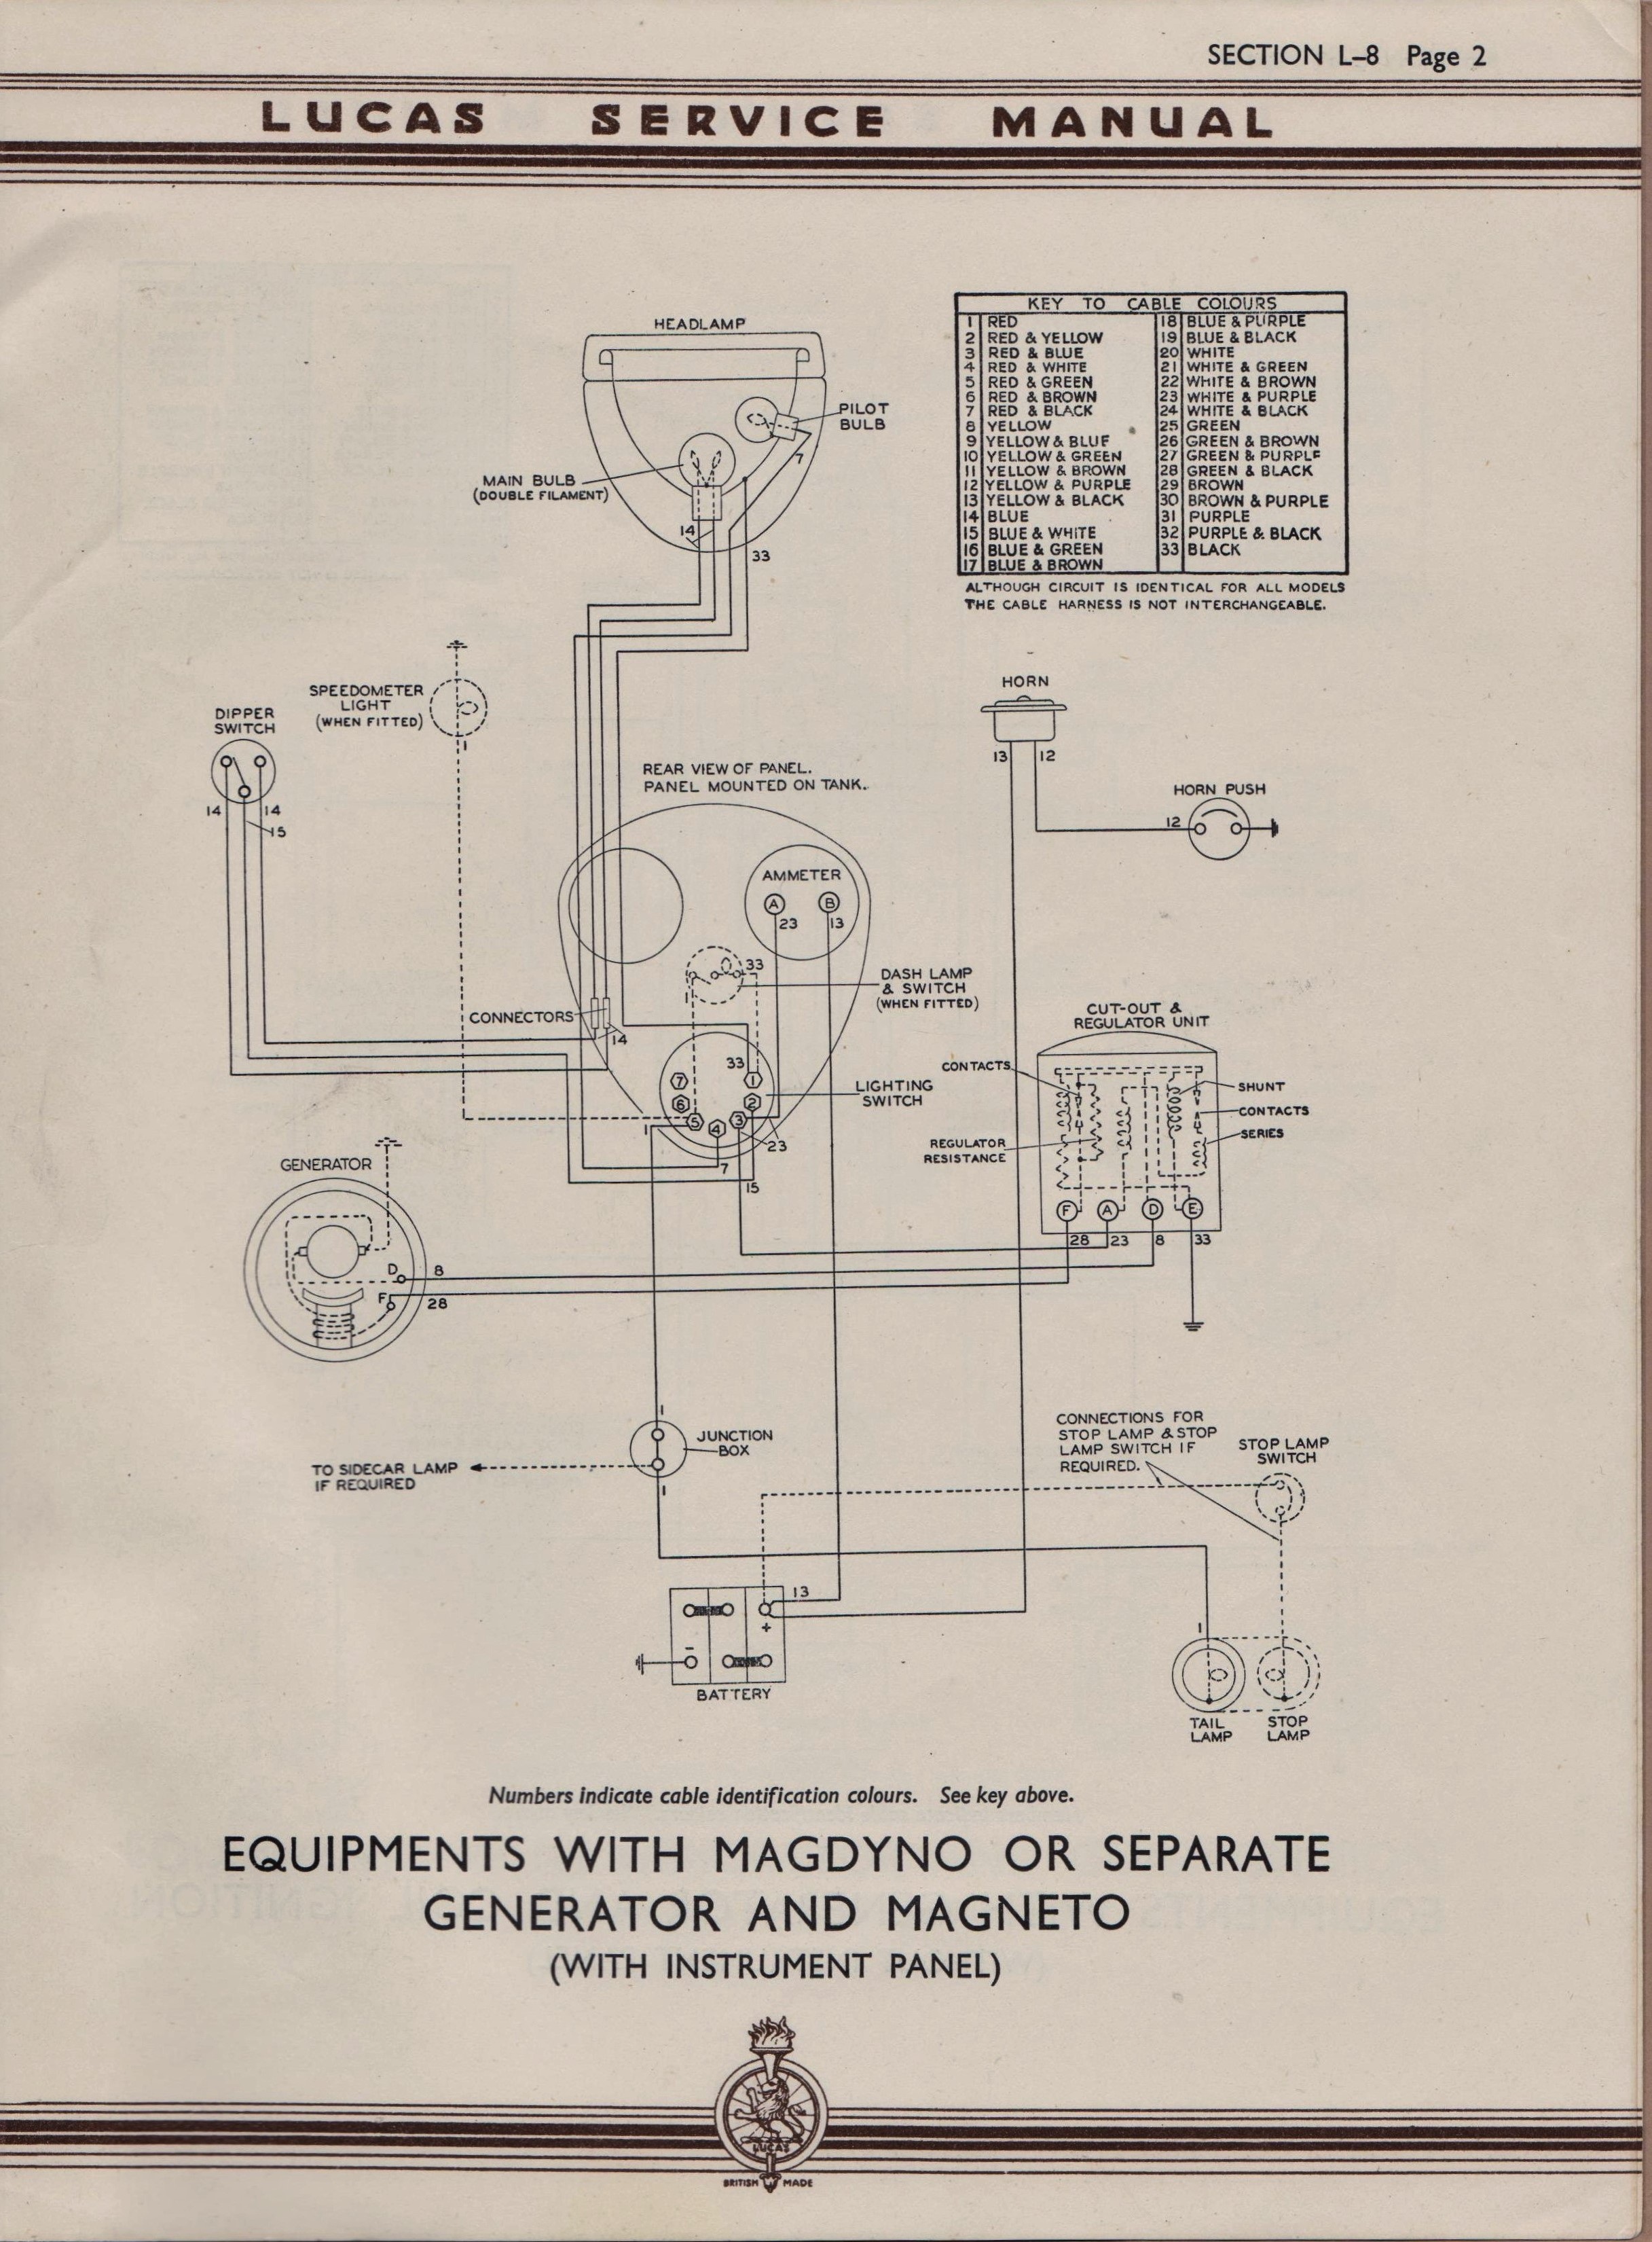 Bsa M20 Wiring Diagram -Home Theater Receiver Wiring Diagram   Begeboy Wiring  Diagram SourceBegeboy Wiring Diagram Source